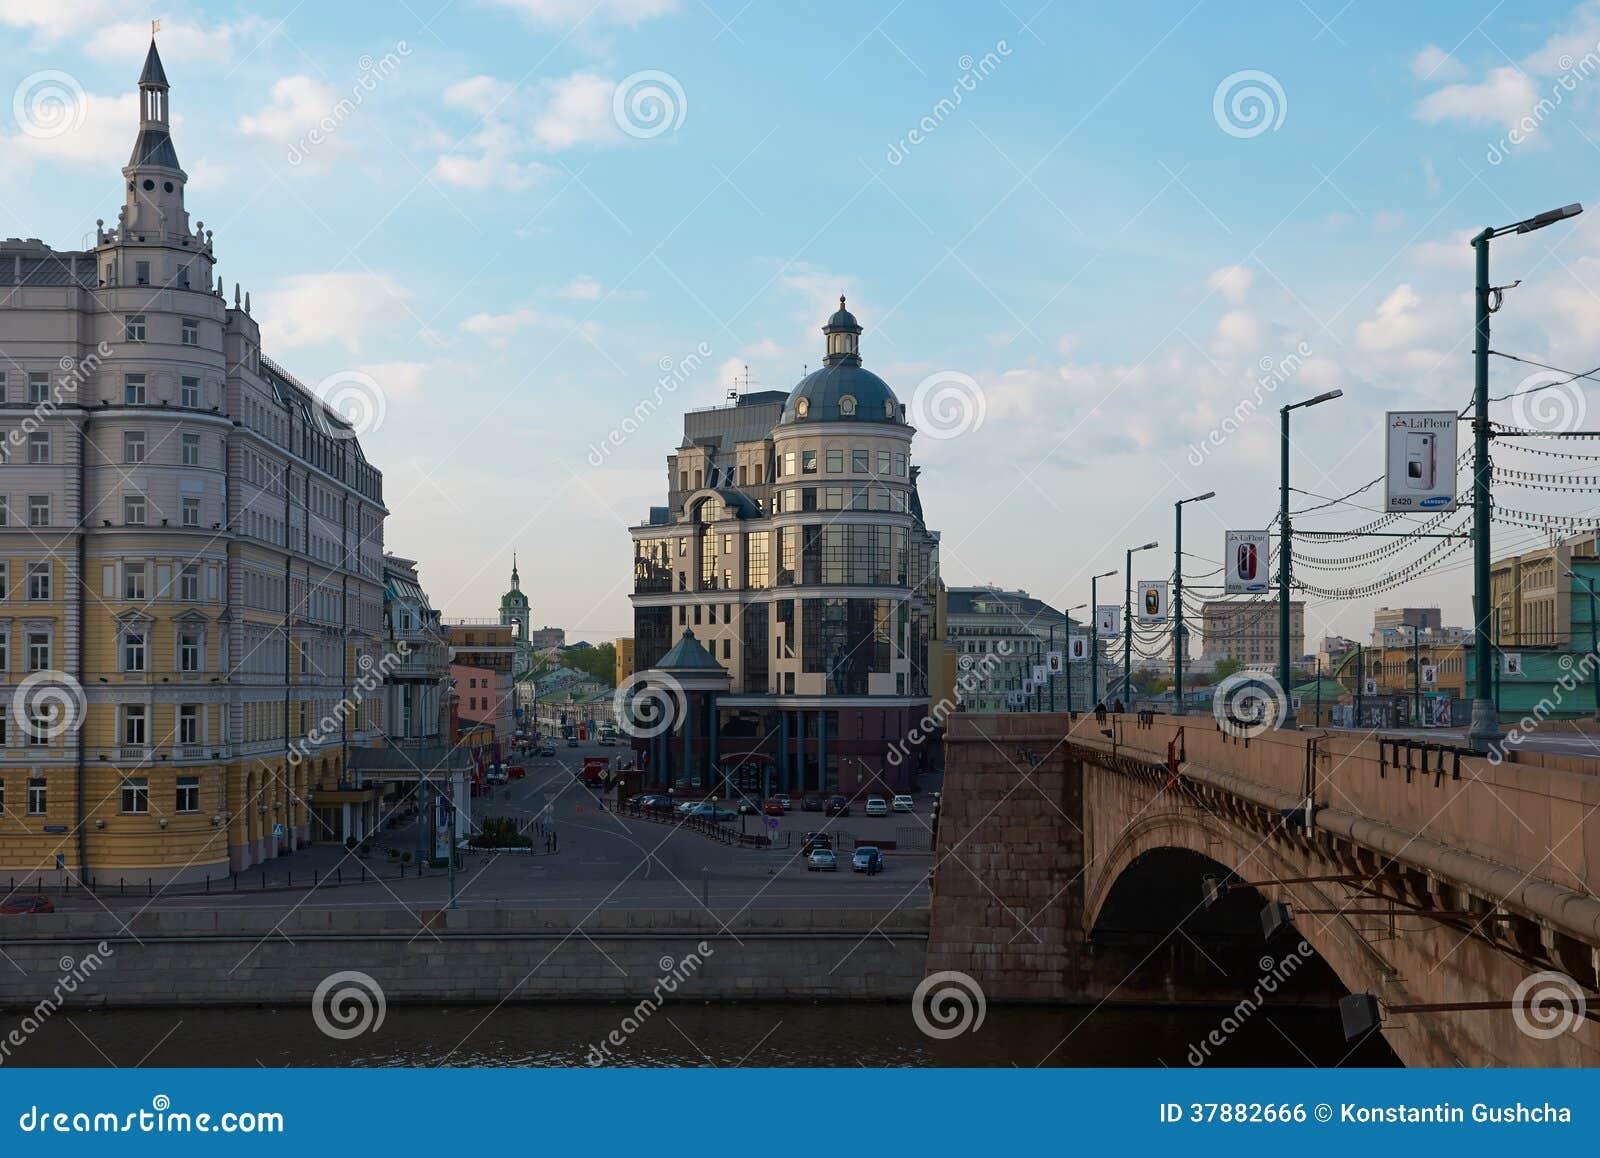 Mening over Balchug-straat in Moskou